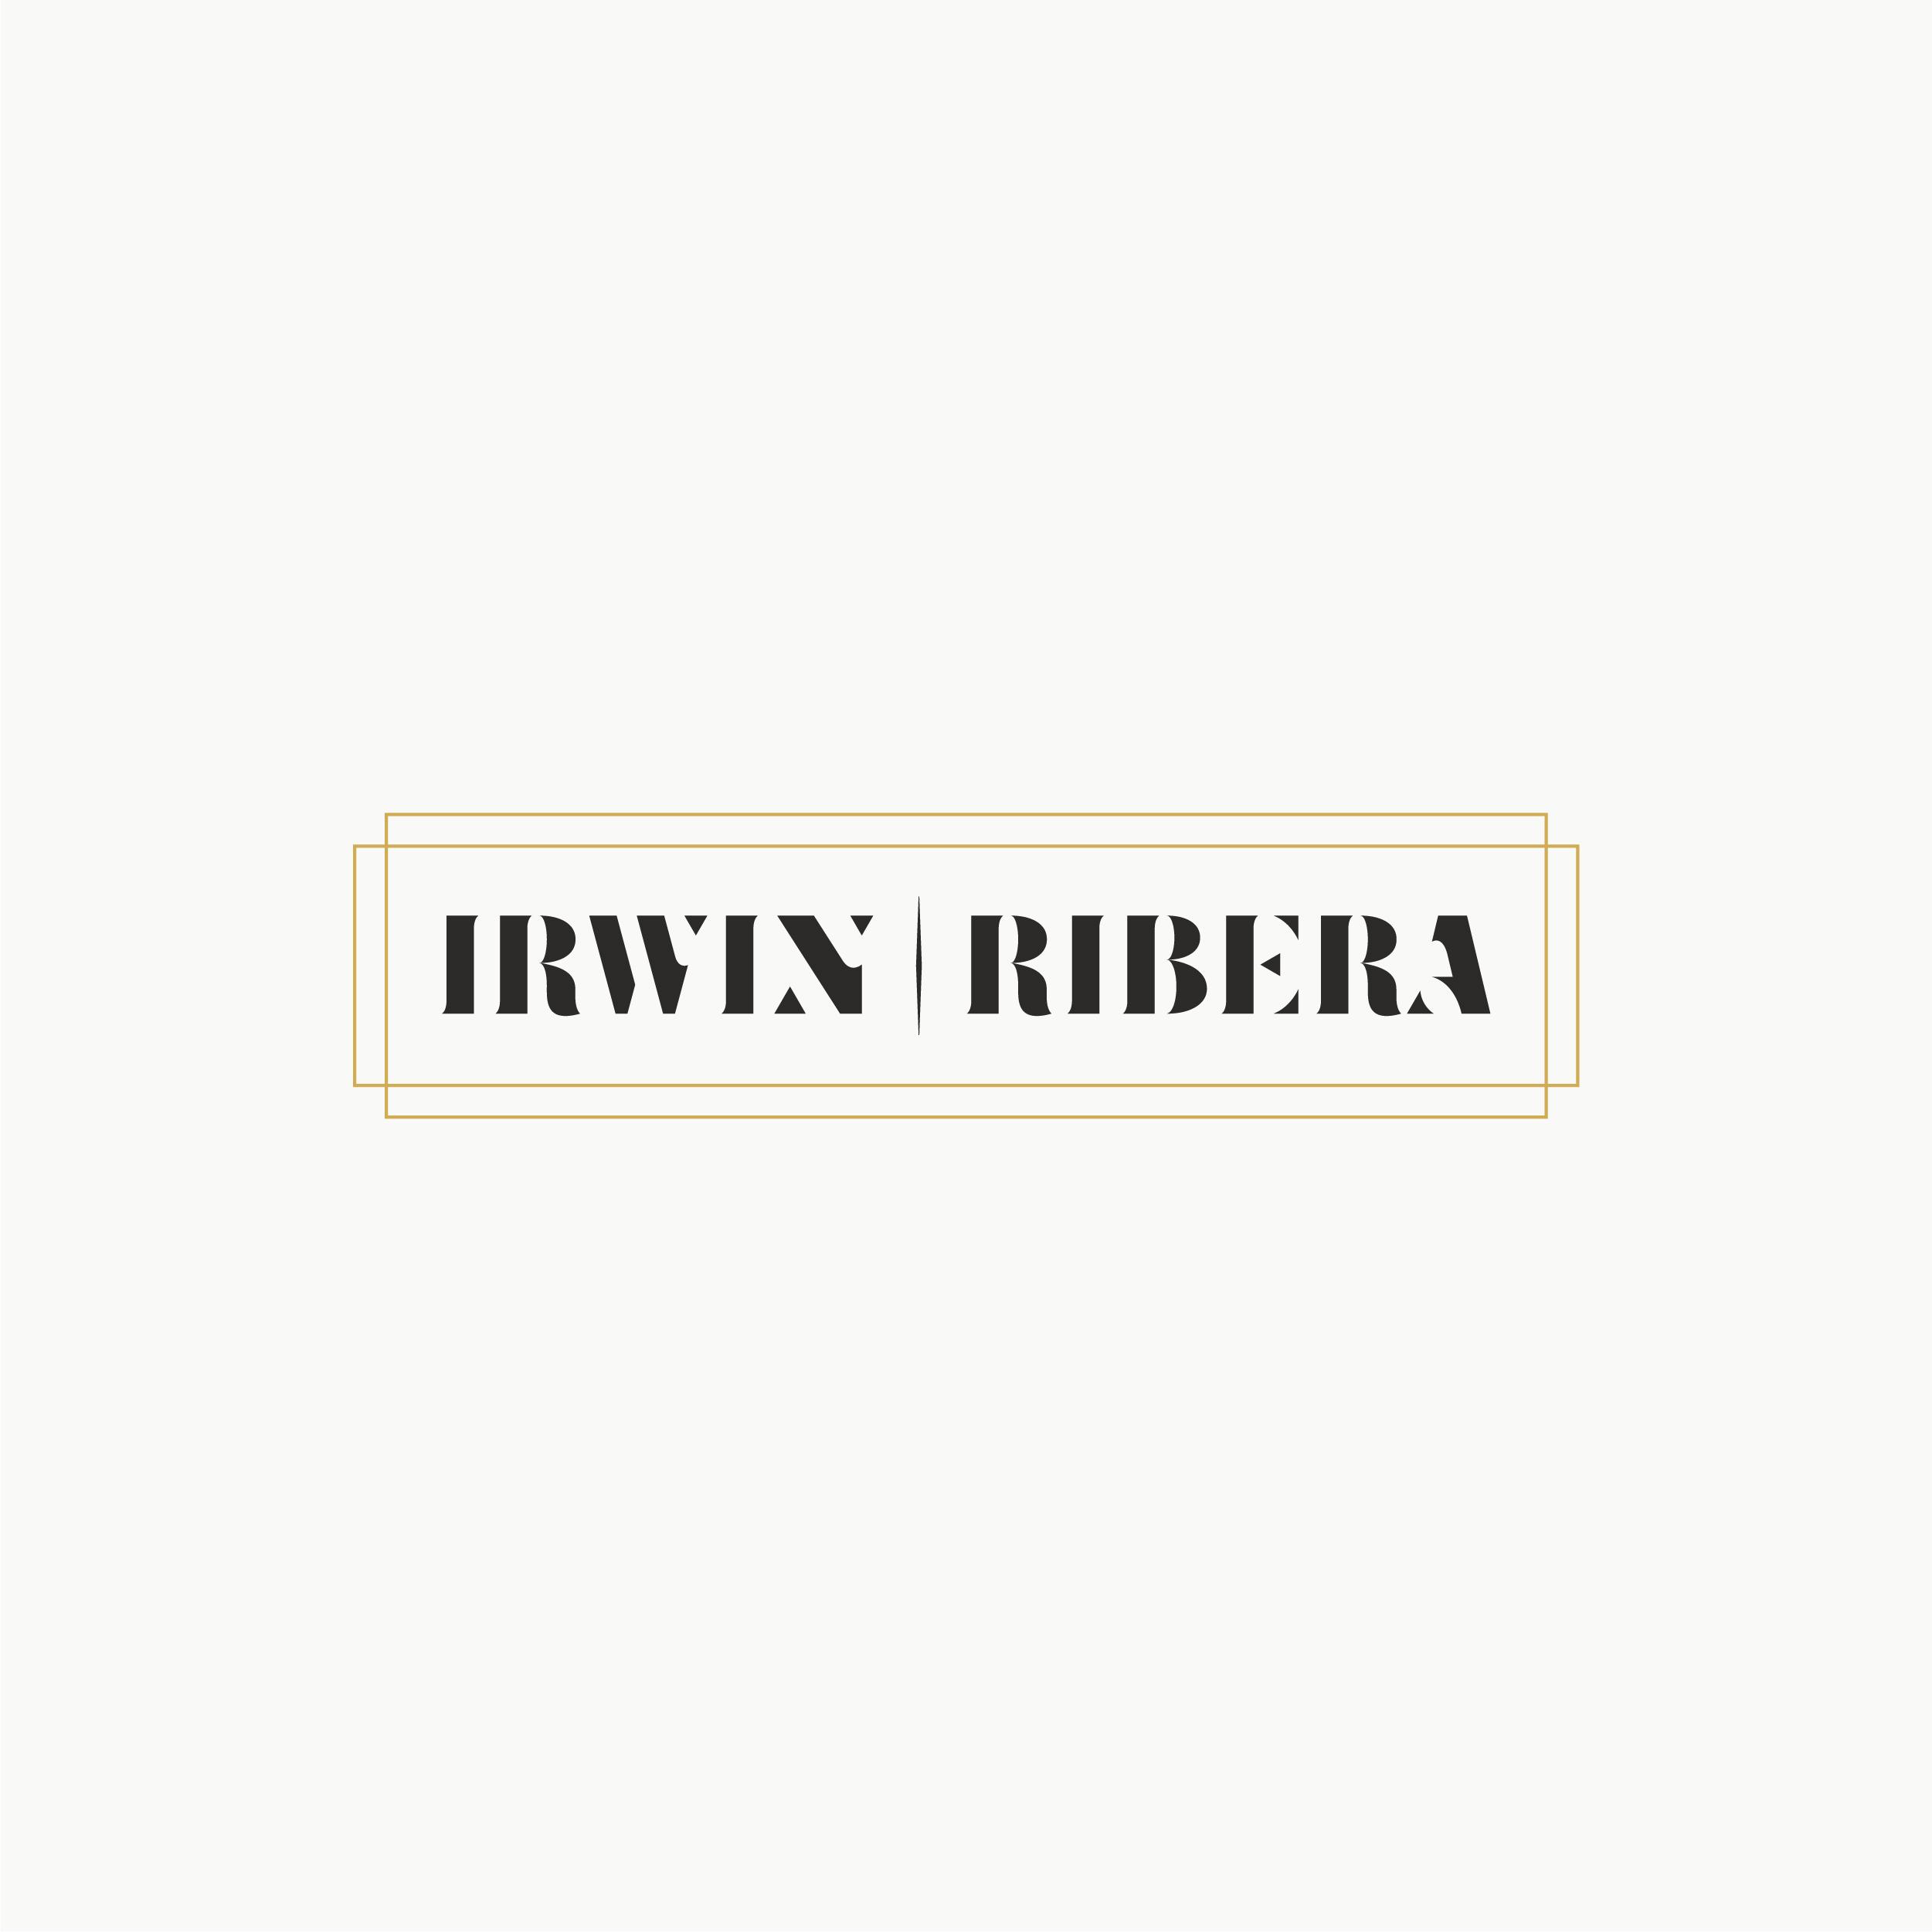 TBS_LogosMarks_IrwinRibera